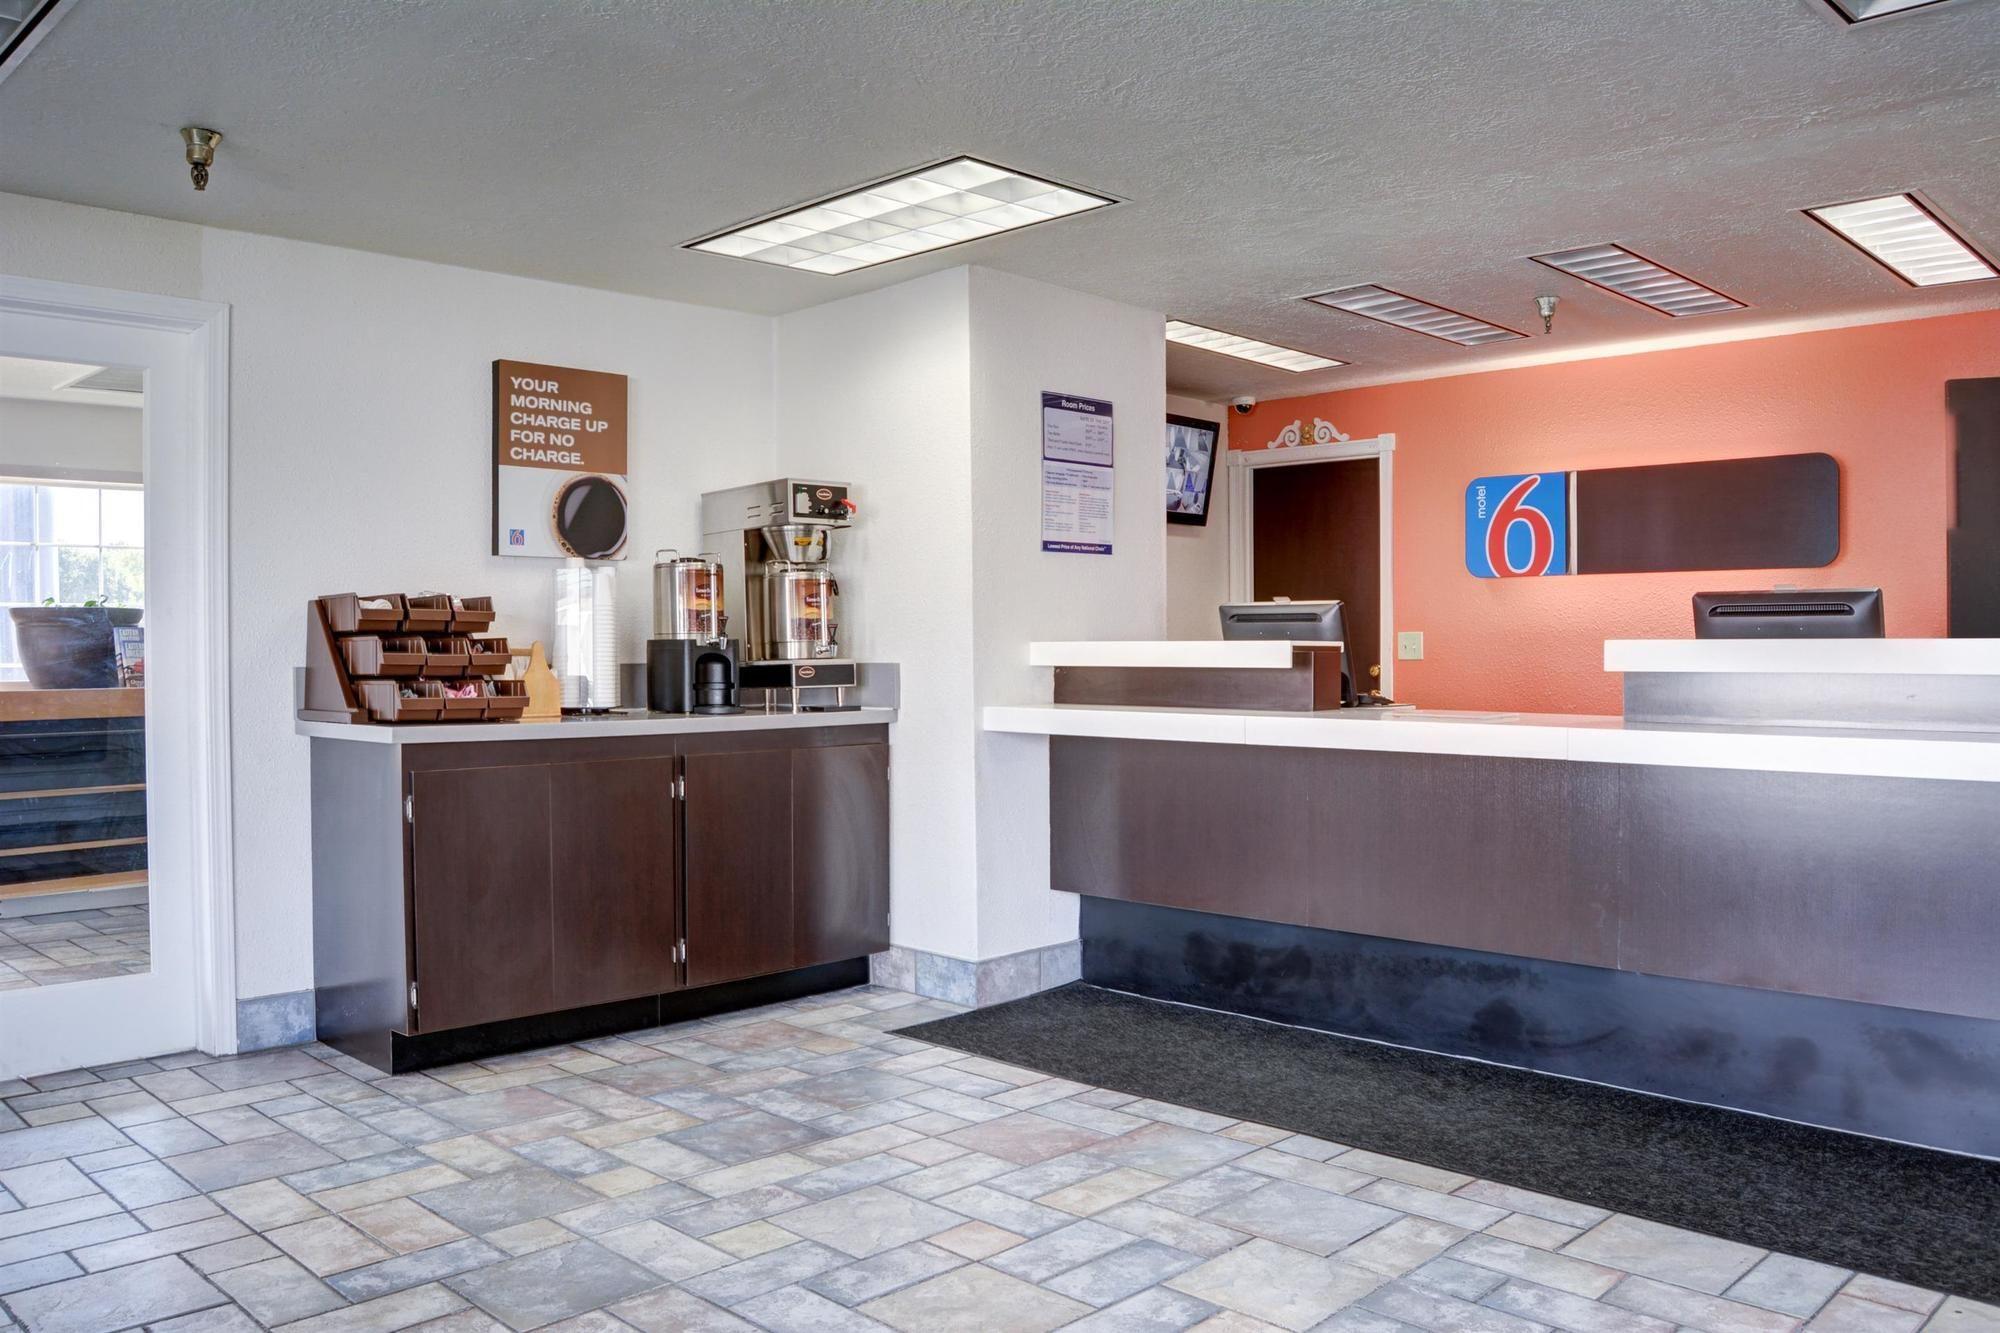 the dalles hotel coupons for the dalles oregon. Black Bedroom Furniture Sets. Home Design Ideas